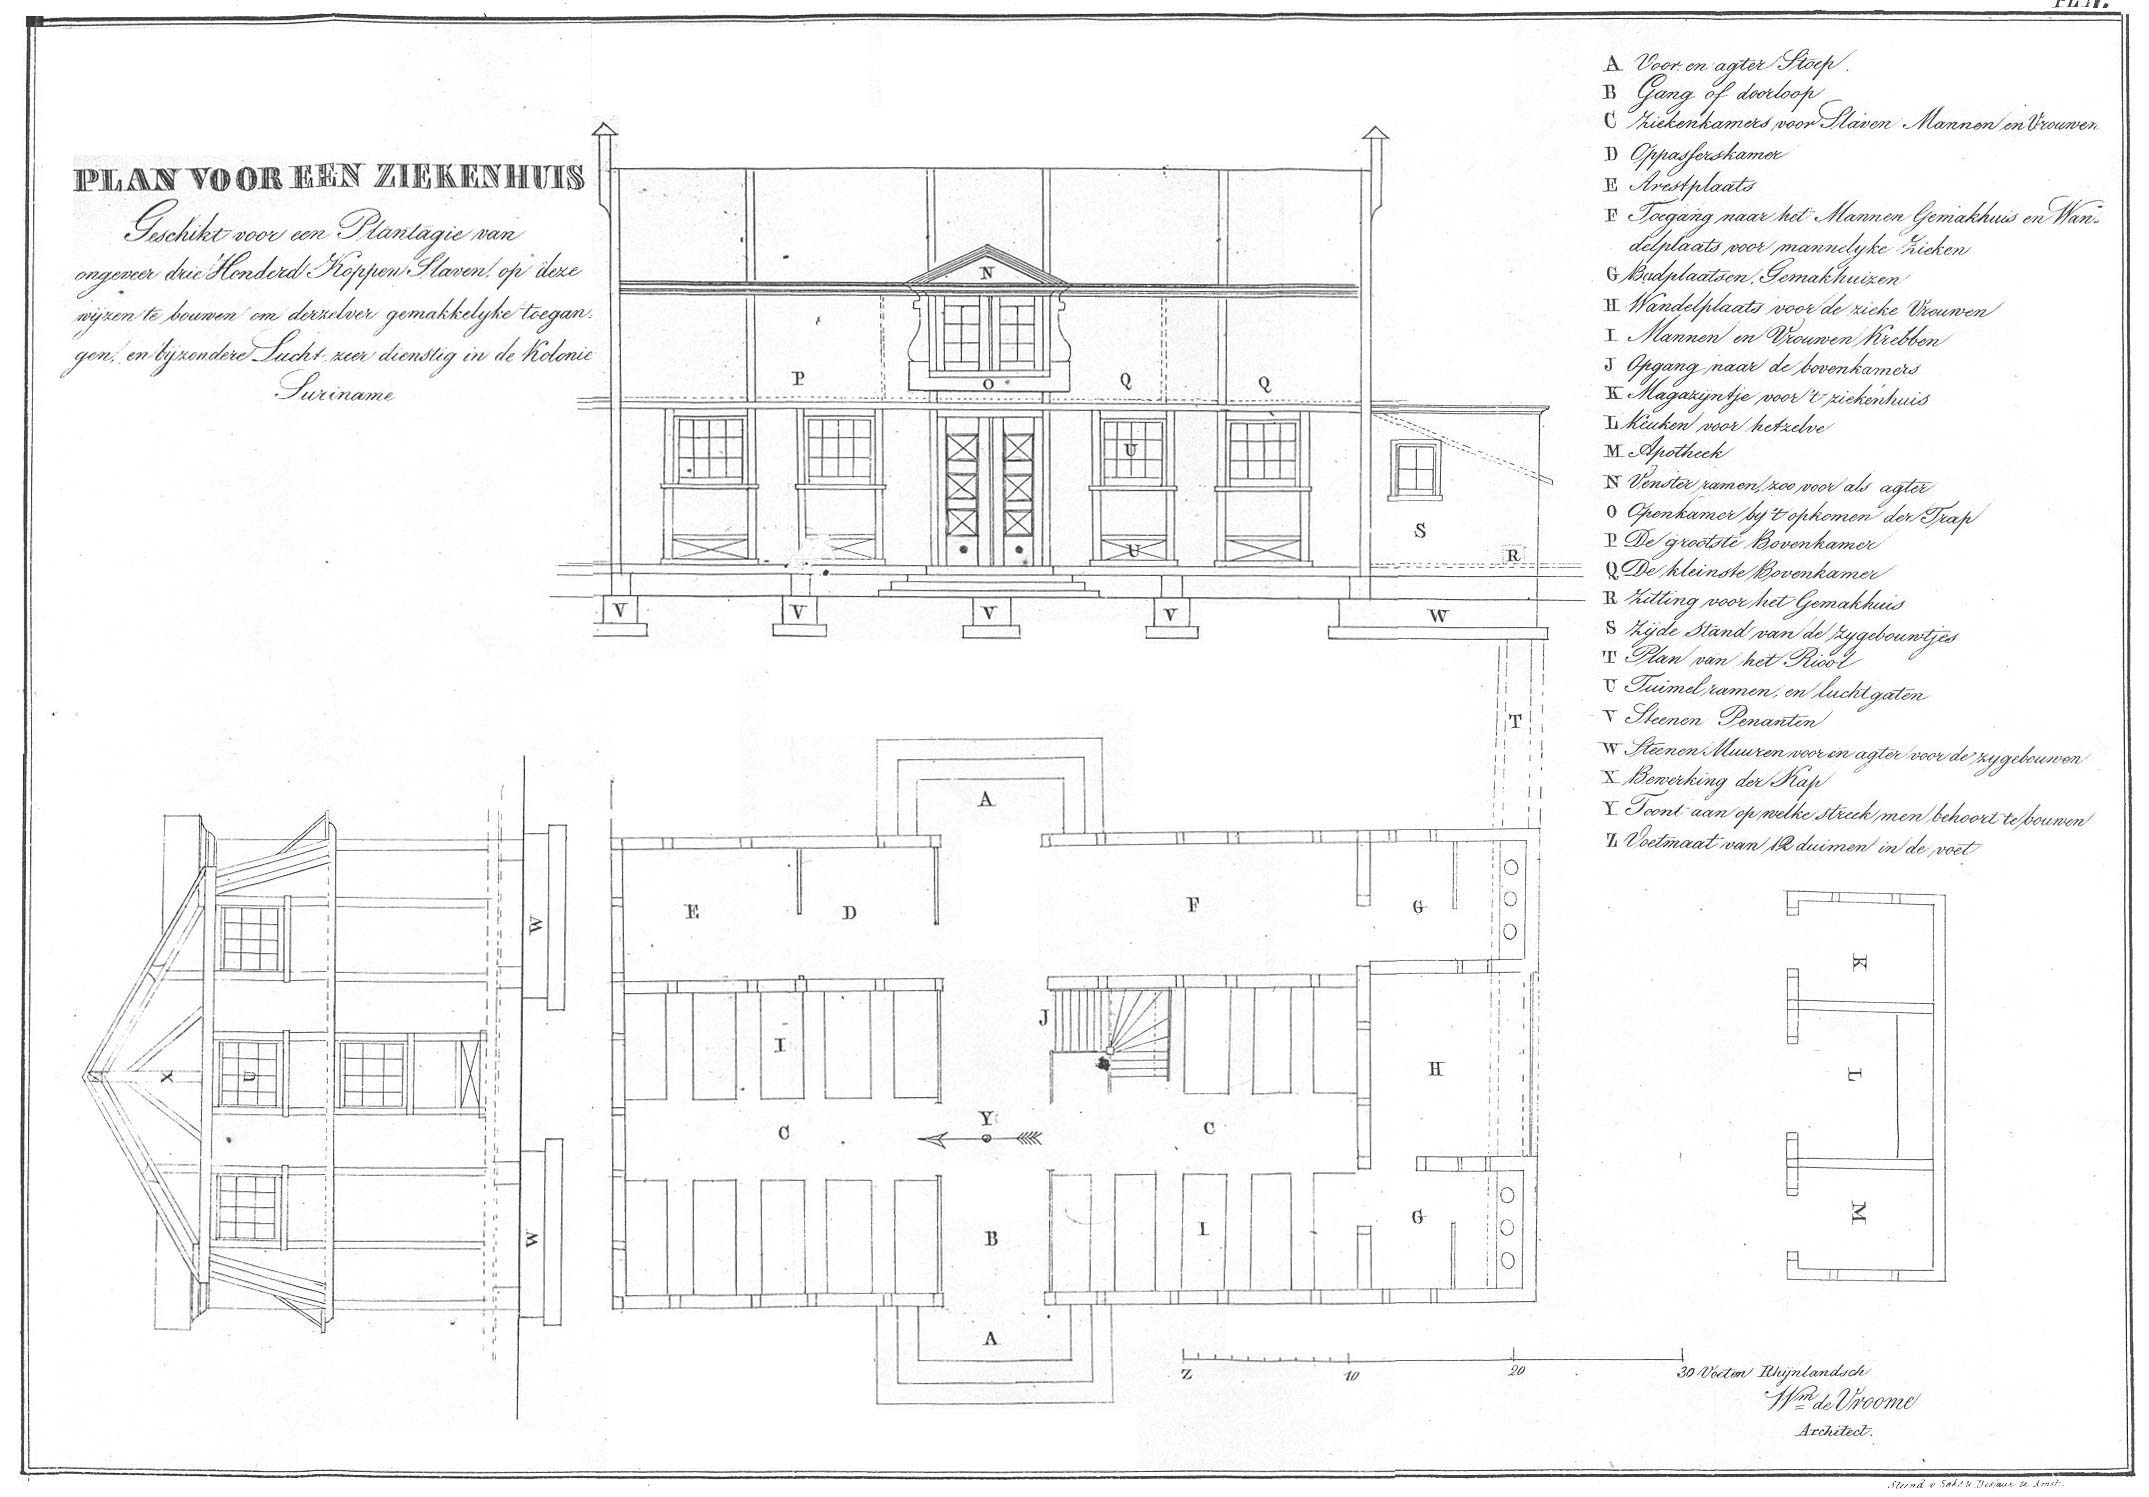 modelhospitaal 1828-01 de Vroome